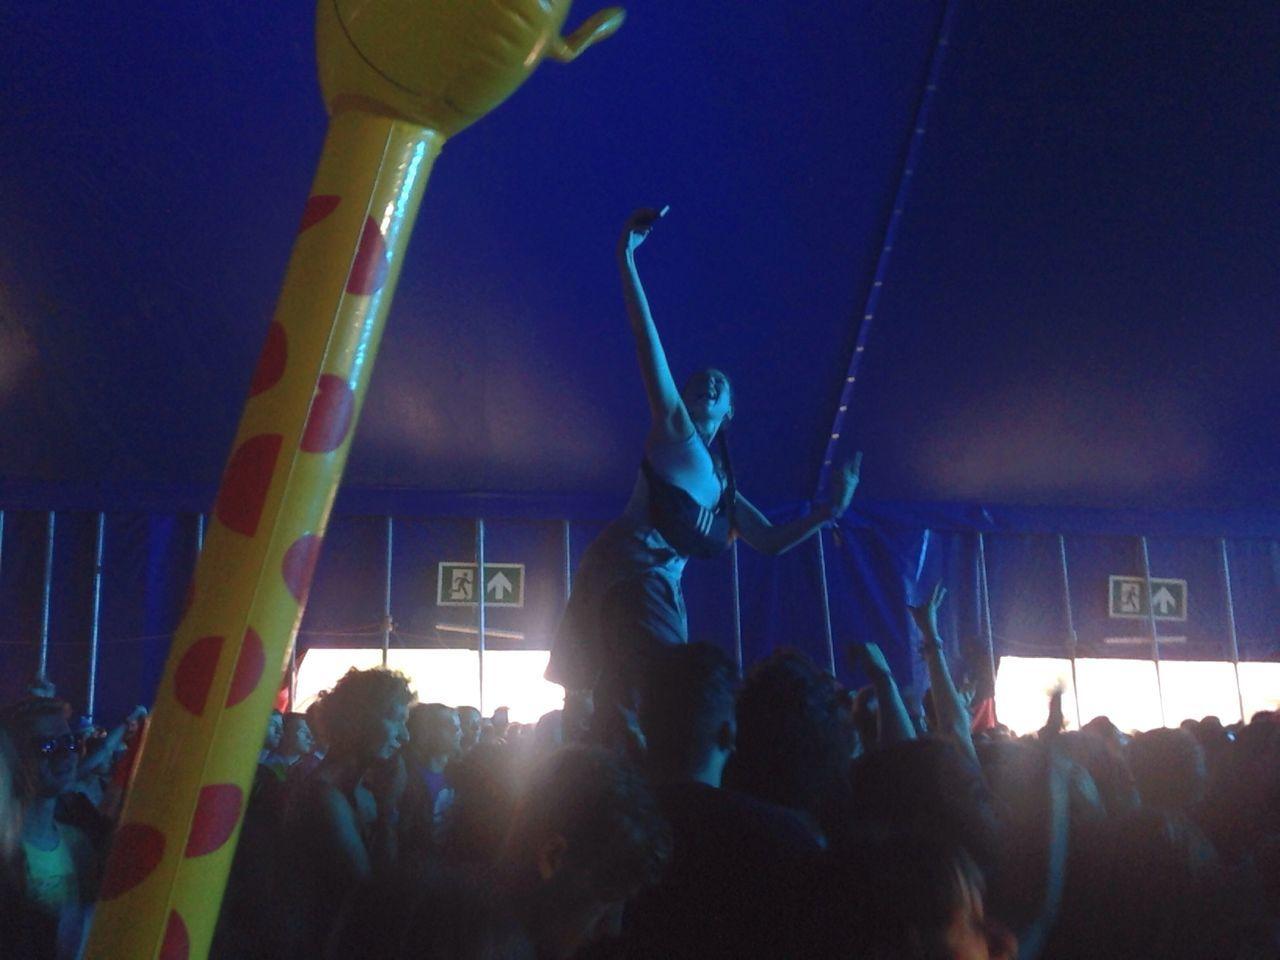 Festival Season Music Girl Selfie ✌ Selfies Crowd Concert Young Hipster